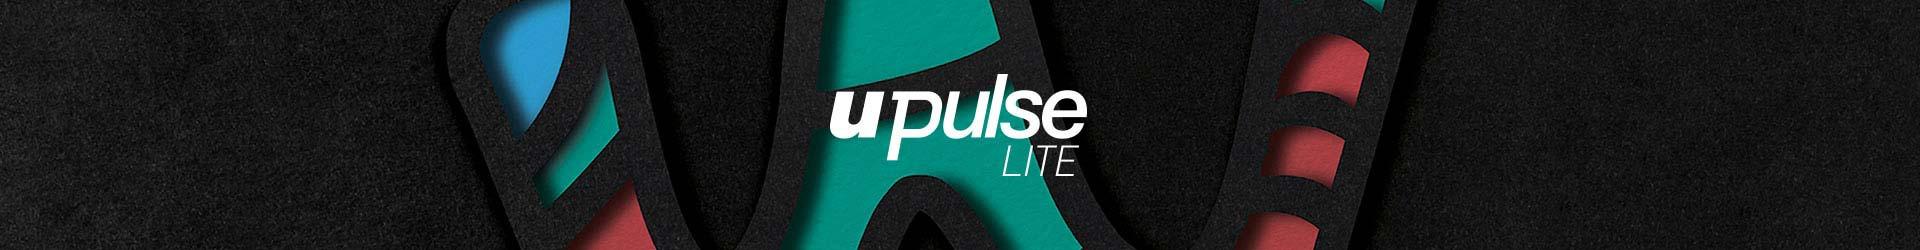 upulse_lite